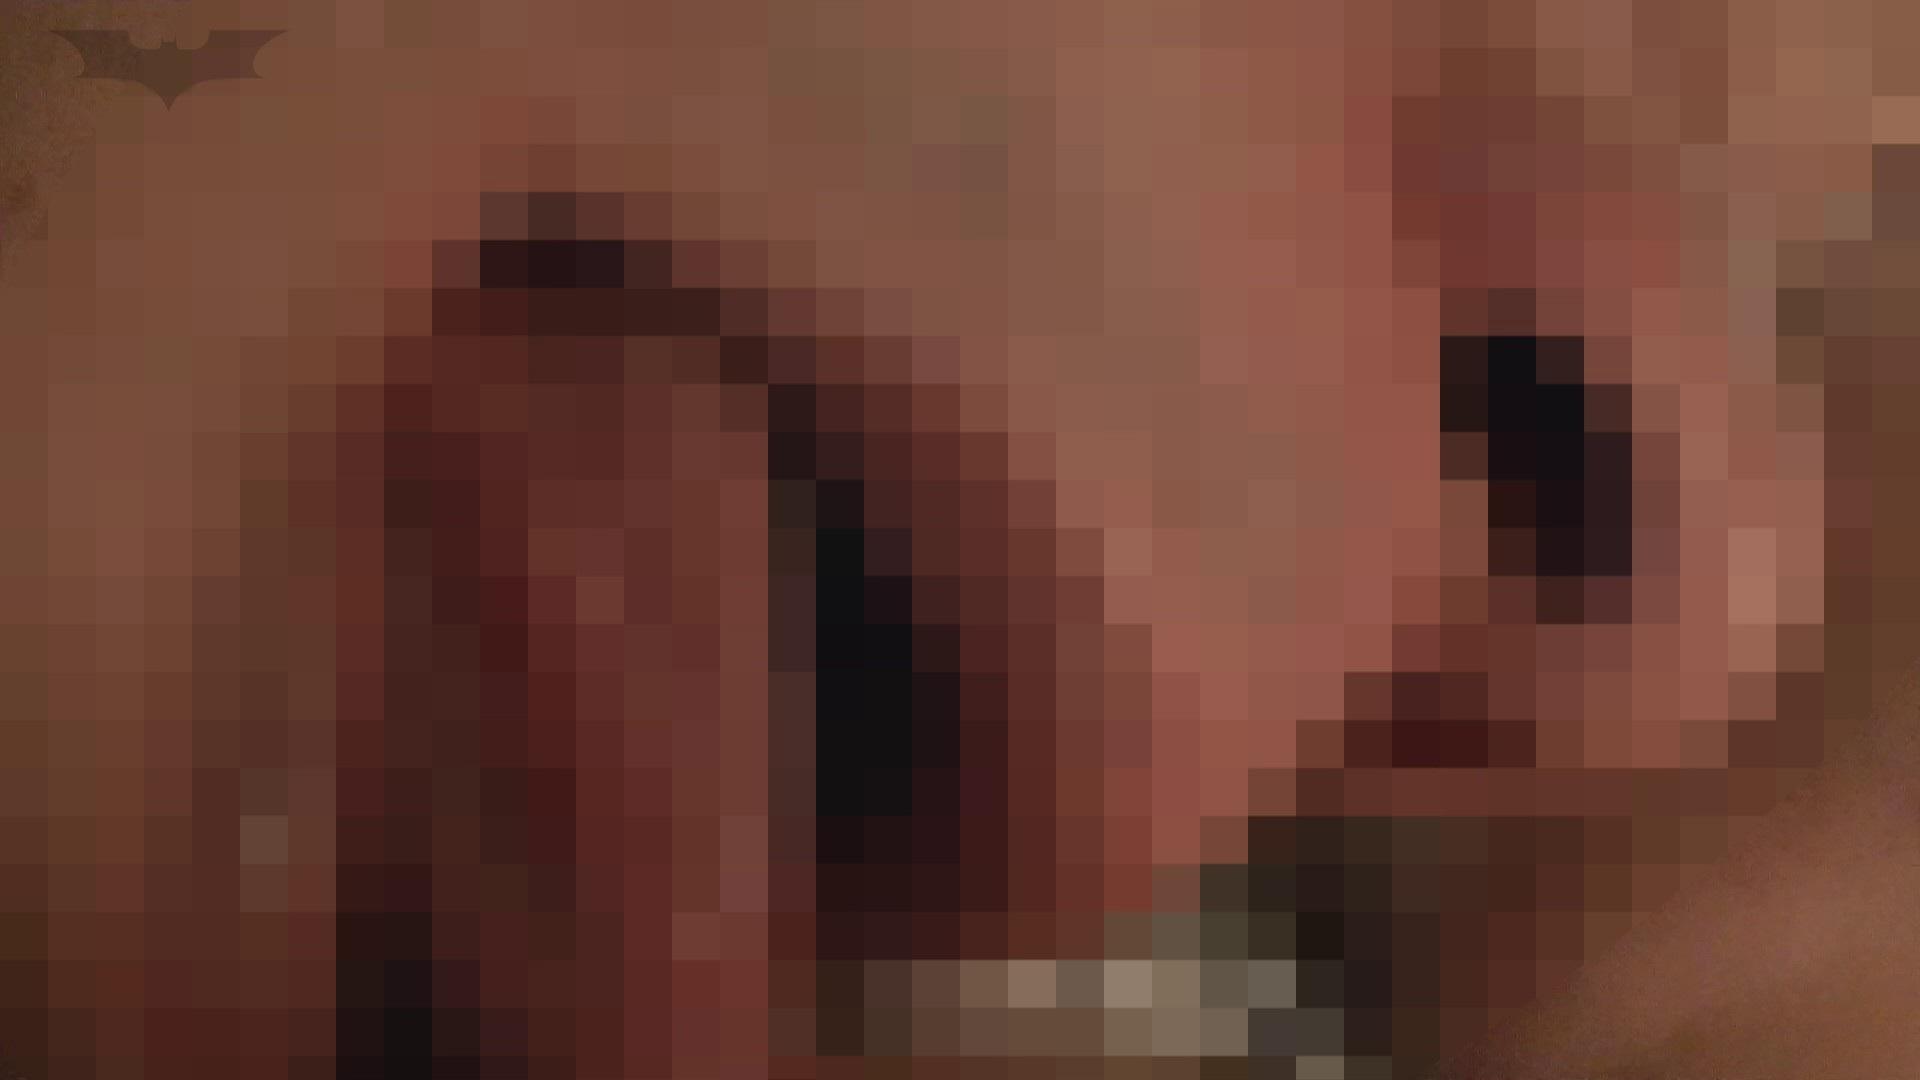 期間限定闇の花道Vol.07 影対姪っ子絶対ダメな調教関係Vol.01 高画質  92PIX 60